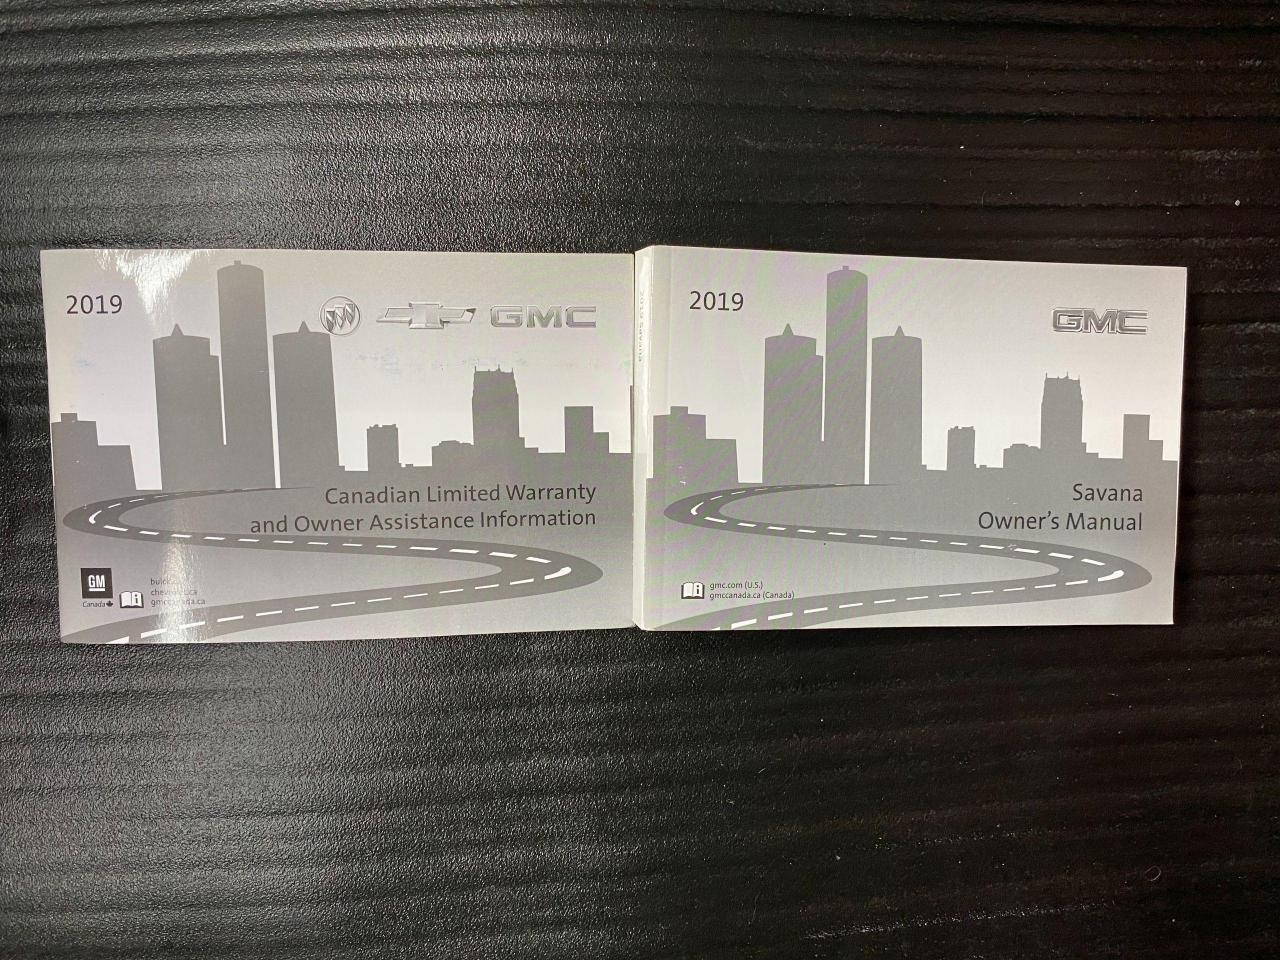 2019 GMC Savana